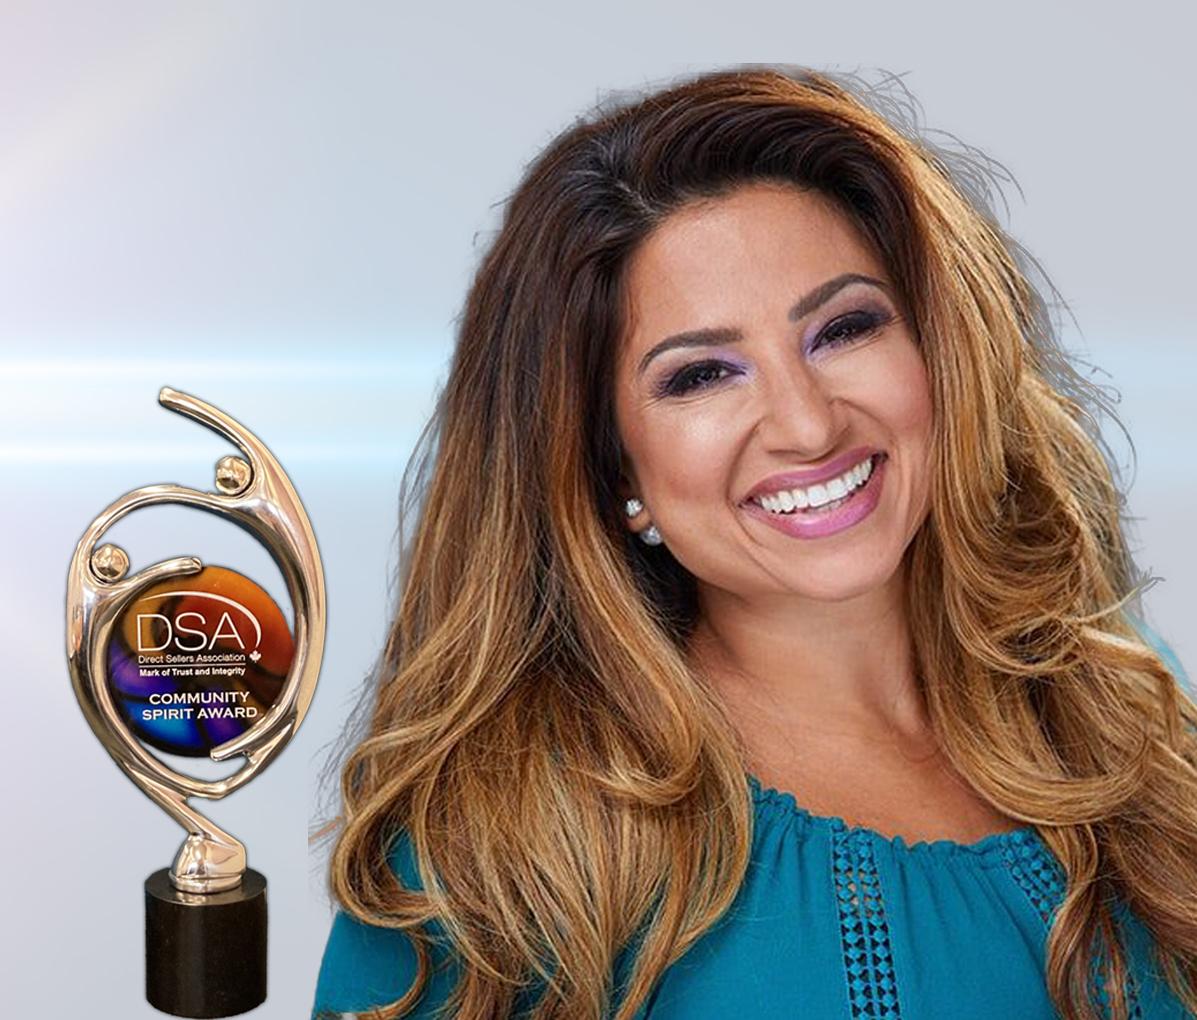 Awards CSA web